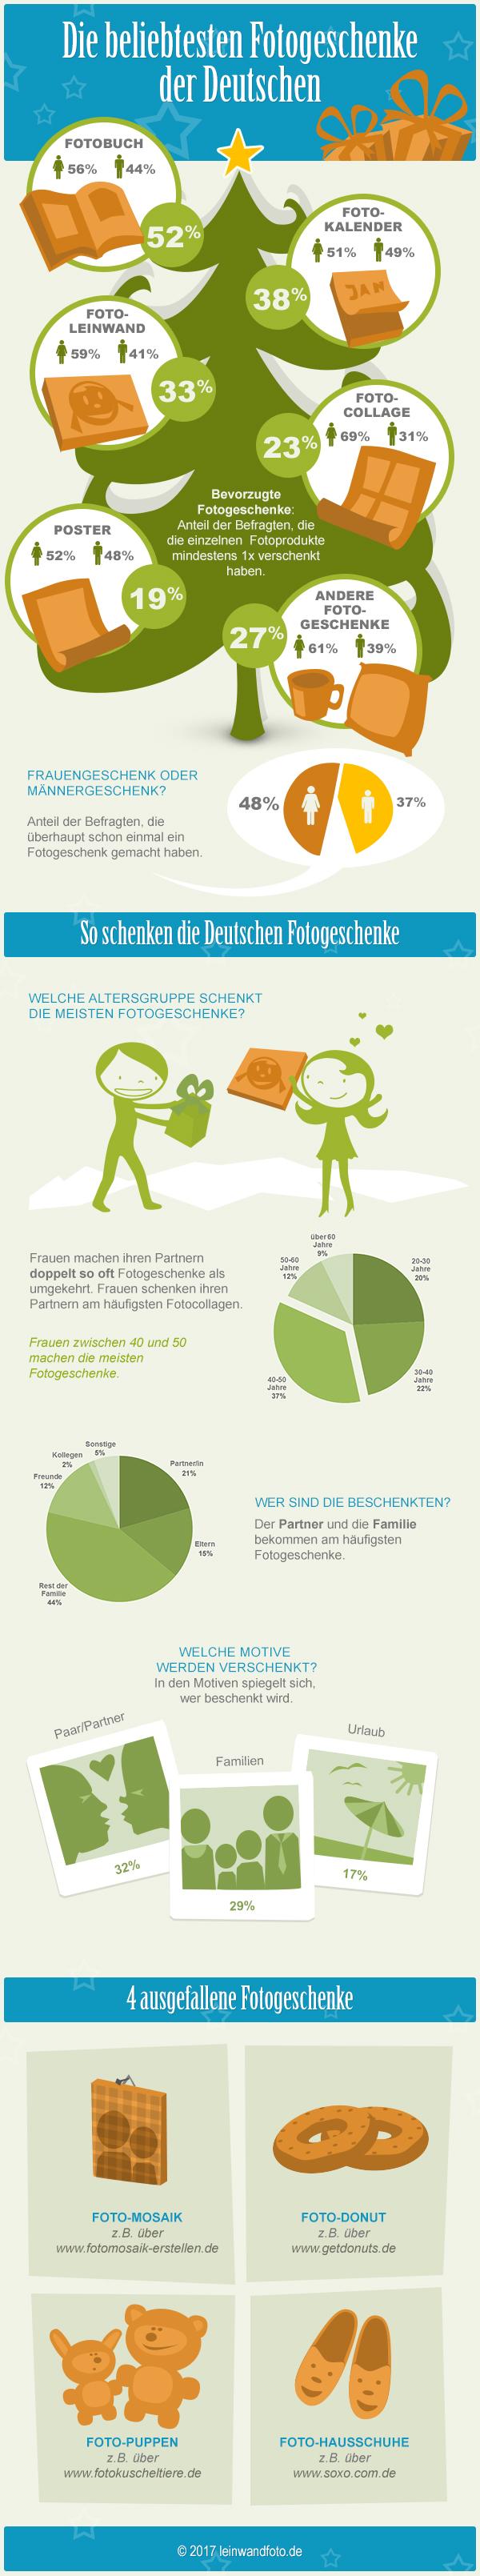 beliebtesten fotogeschenke infografik